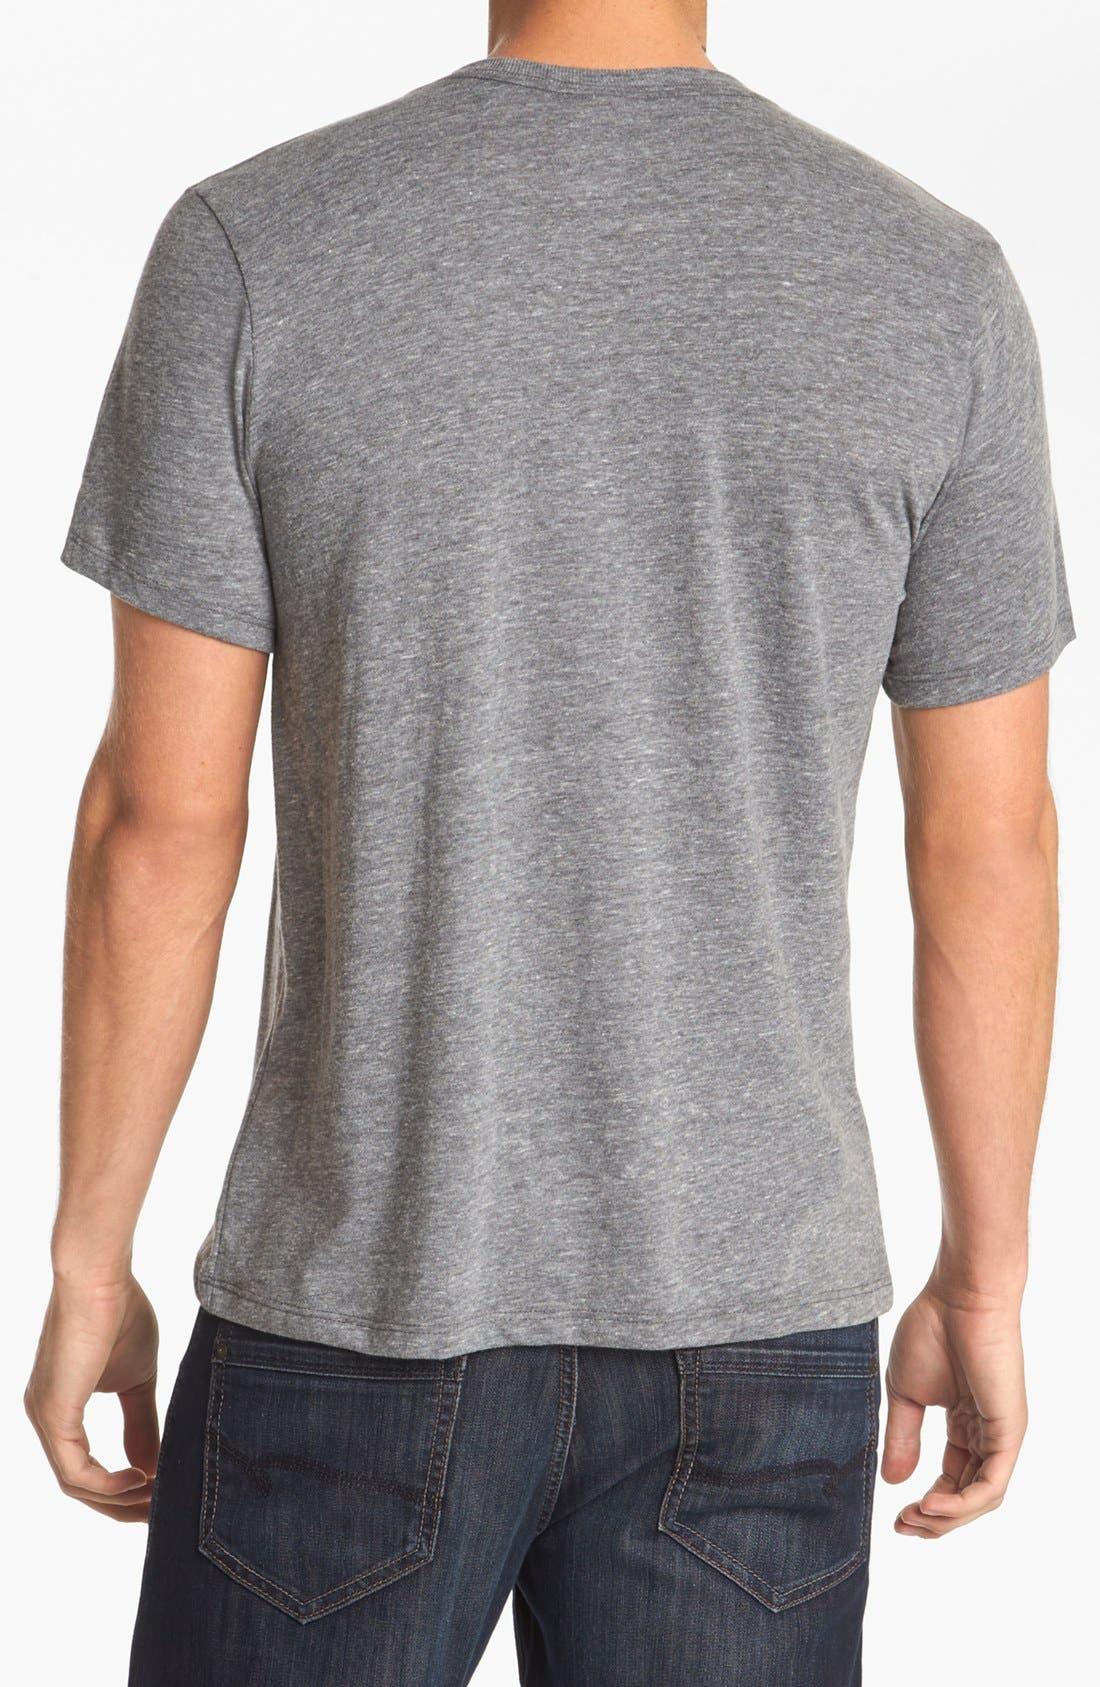 Alternate Image 2  - Junk Food 'Touchdown - Tampa Bay Buccaneers' T-Shirt